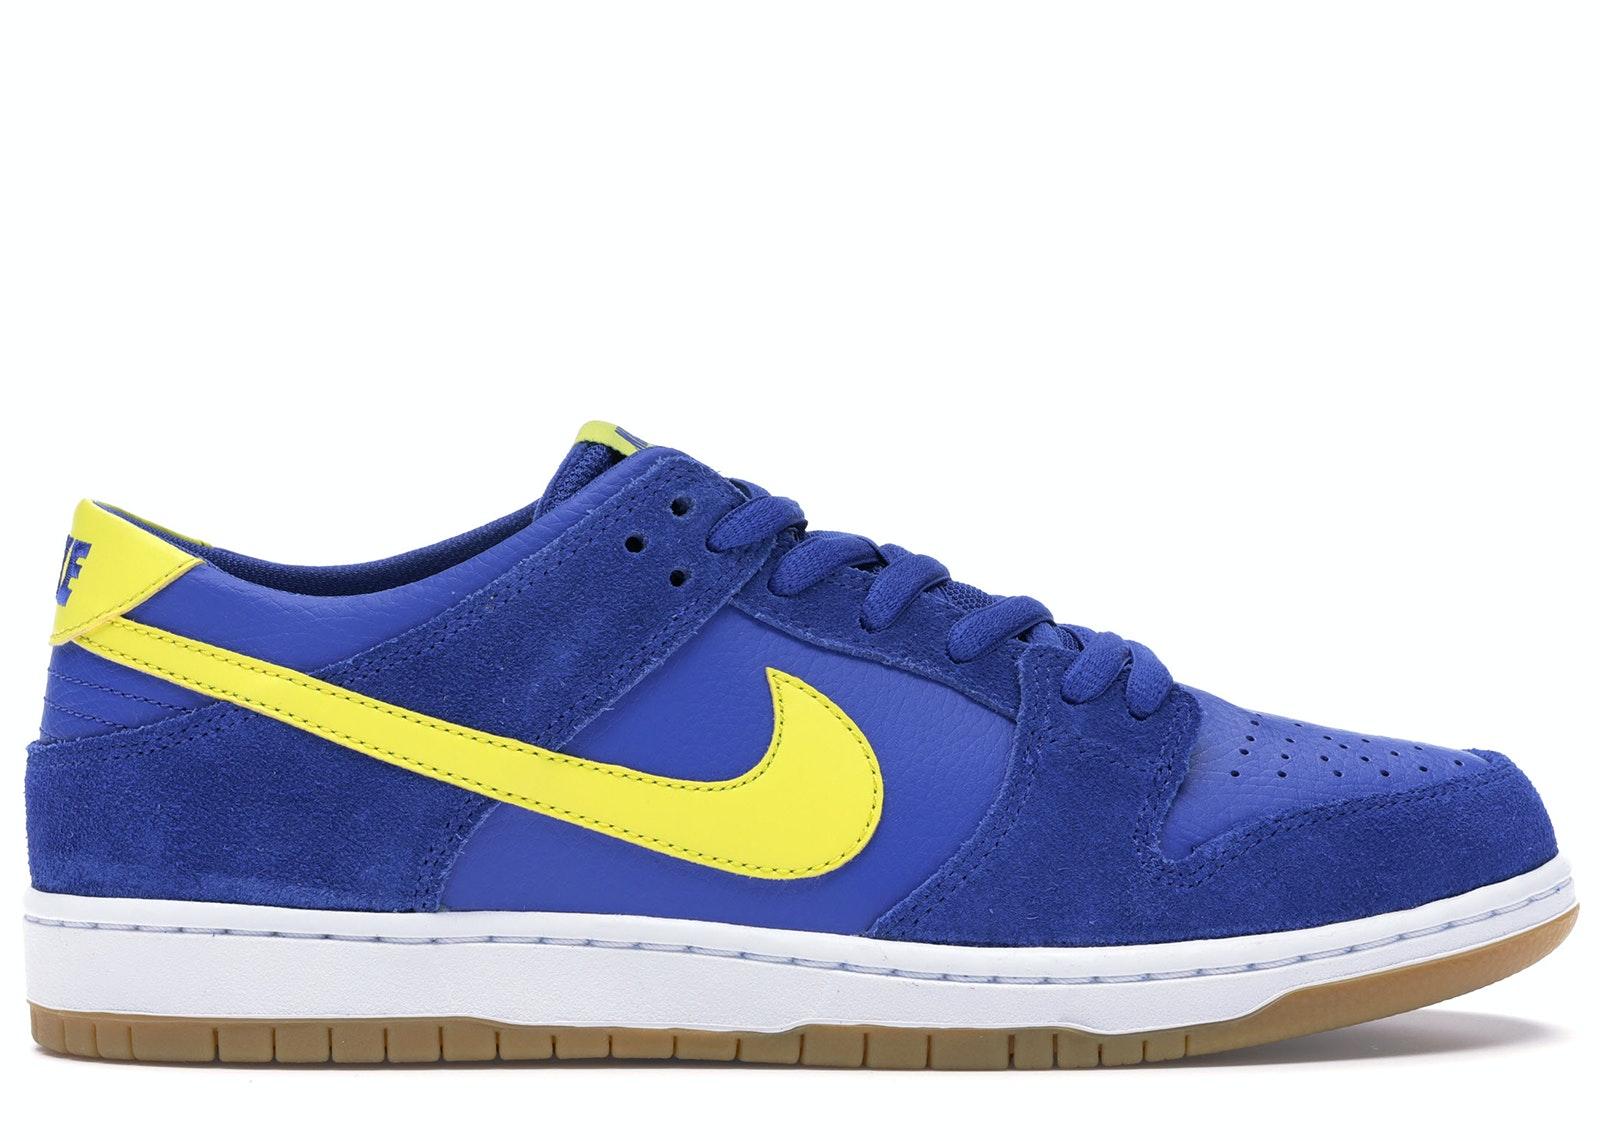 Nike SB Dunk Low Boca Jr